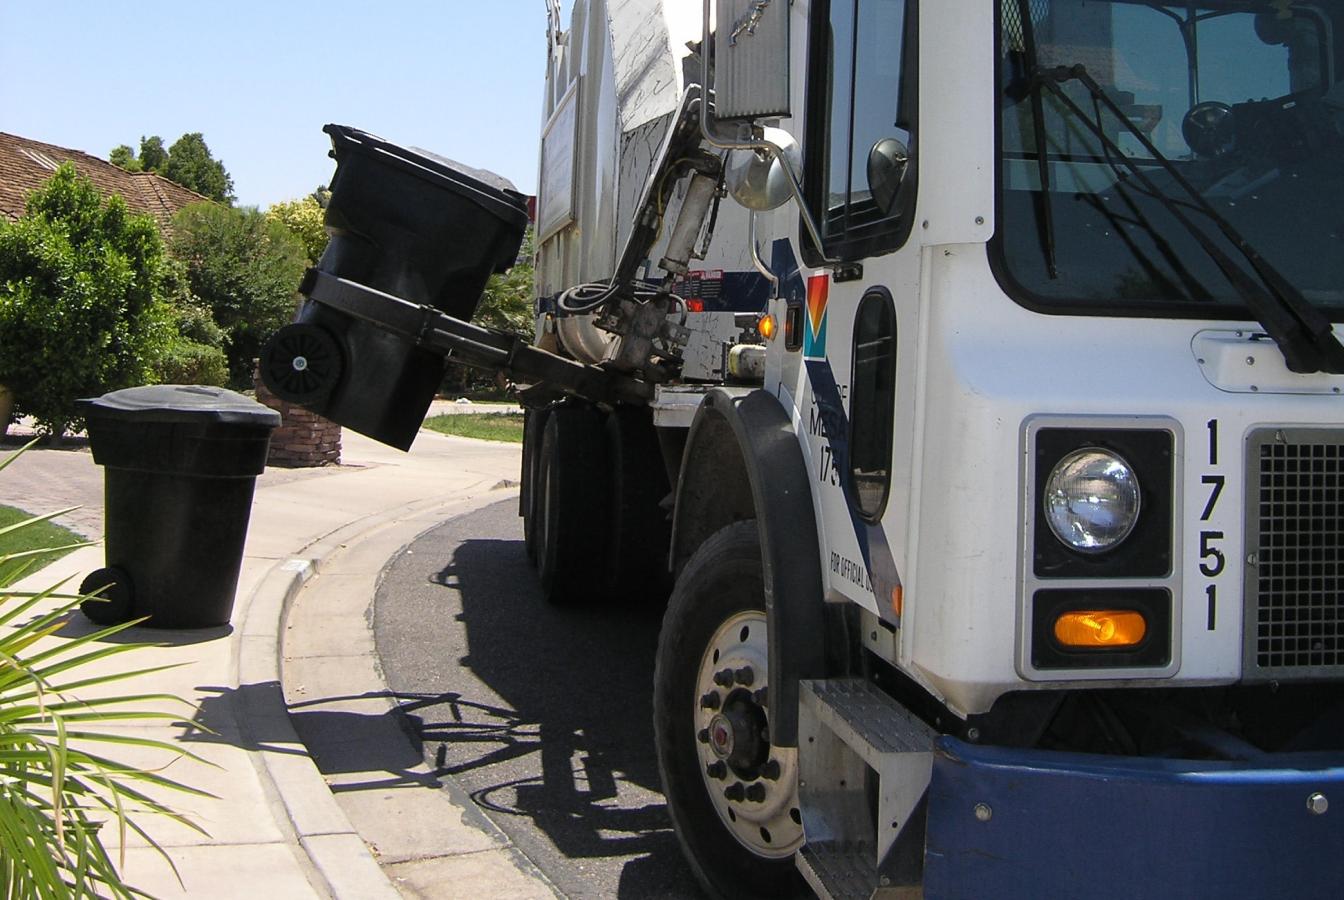 Mechanized garbage truck picking up bin